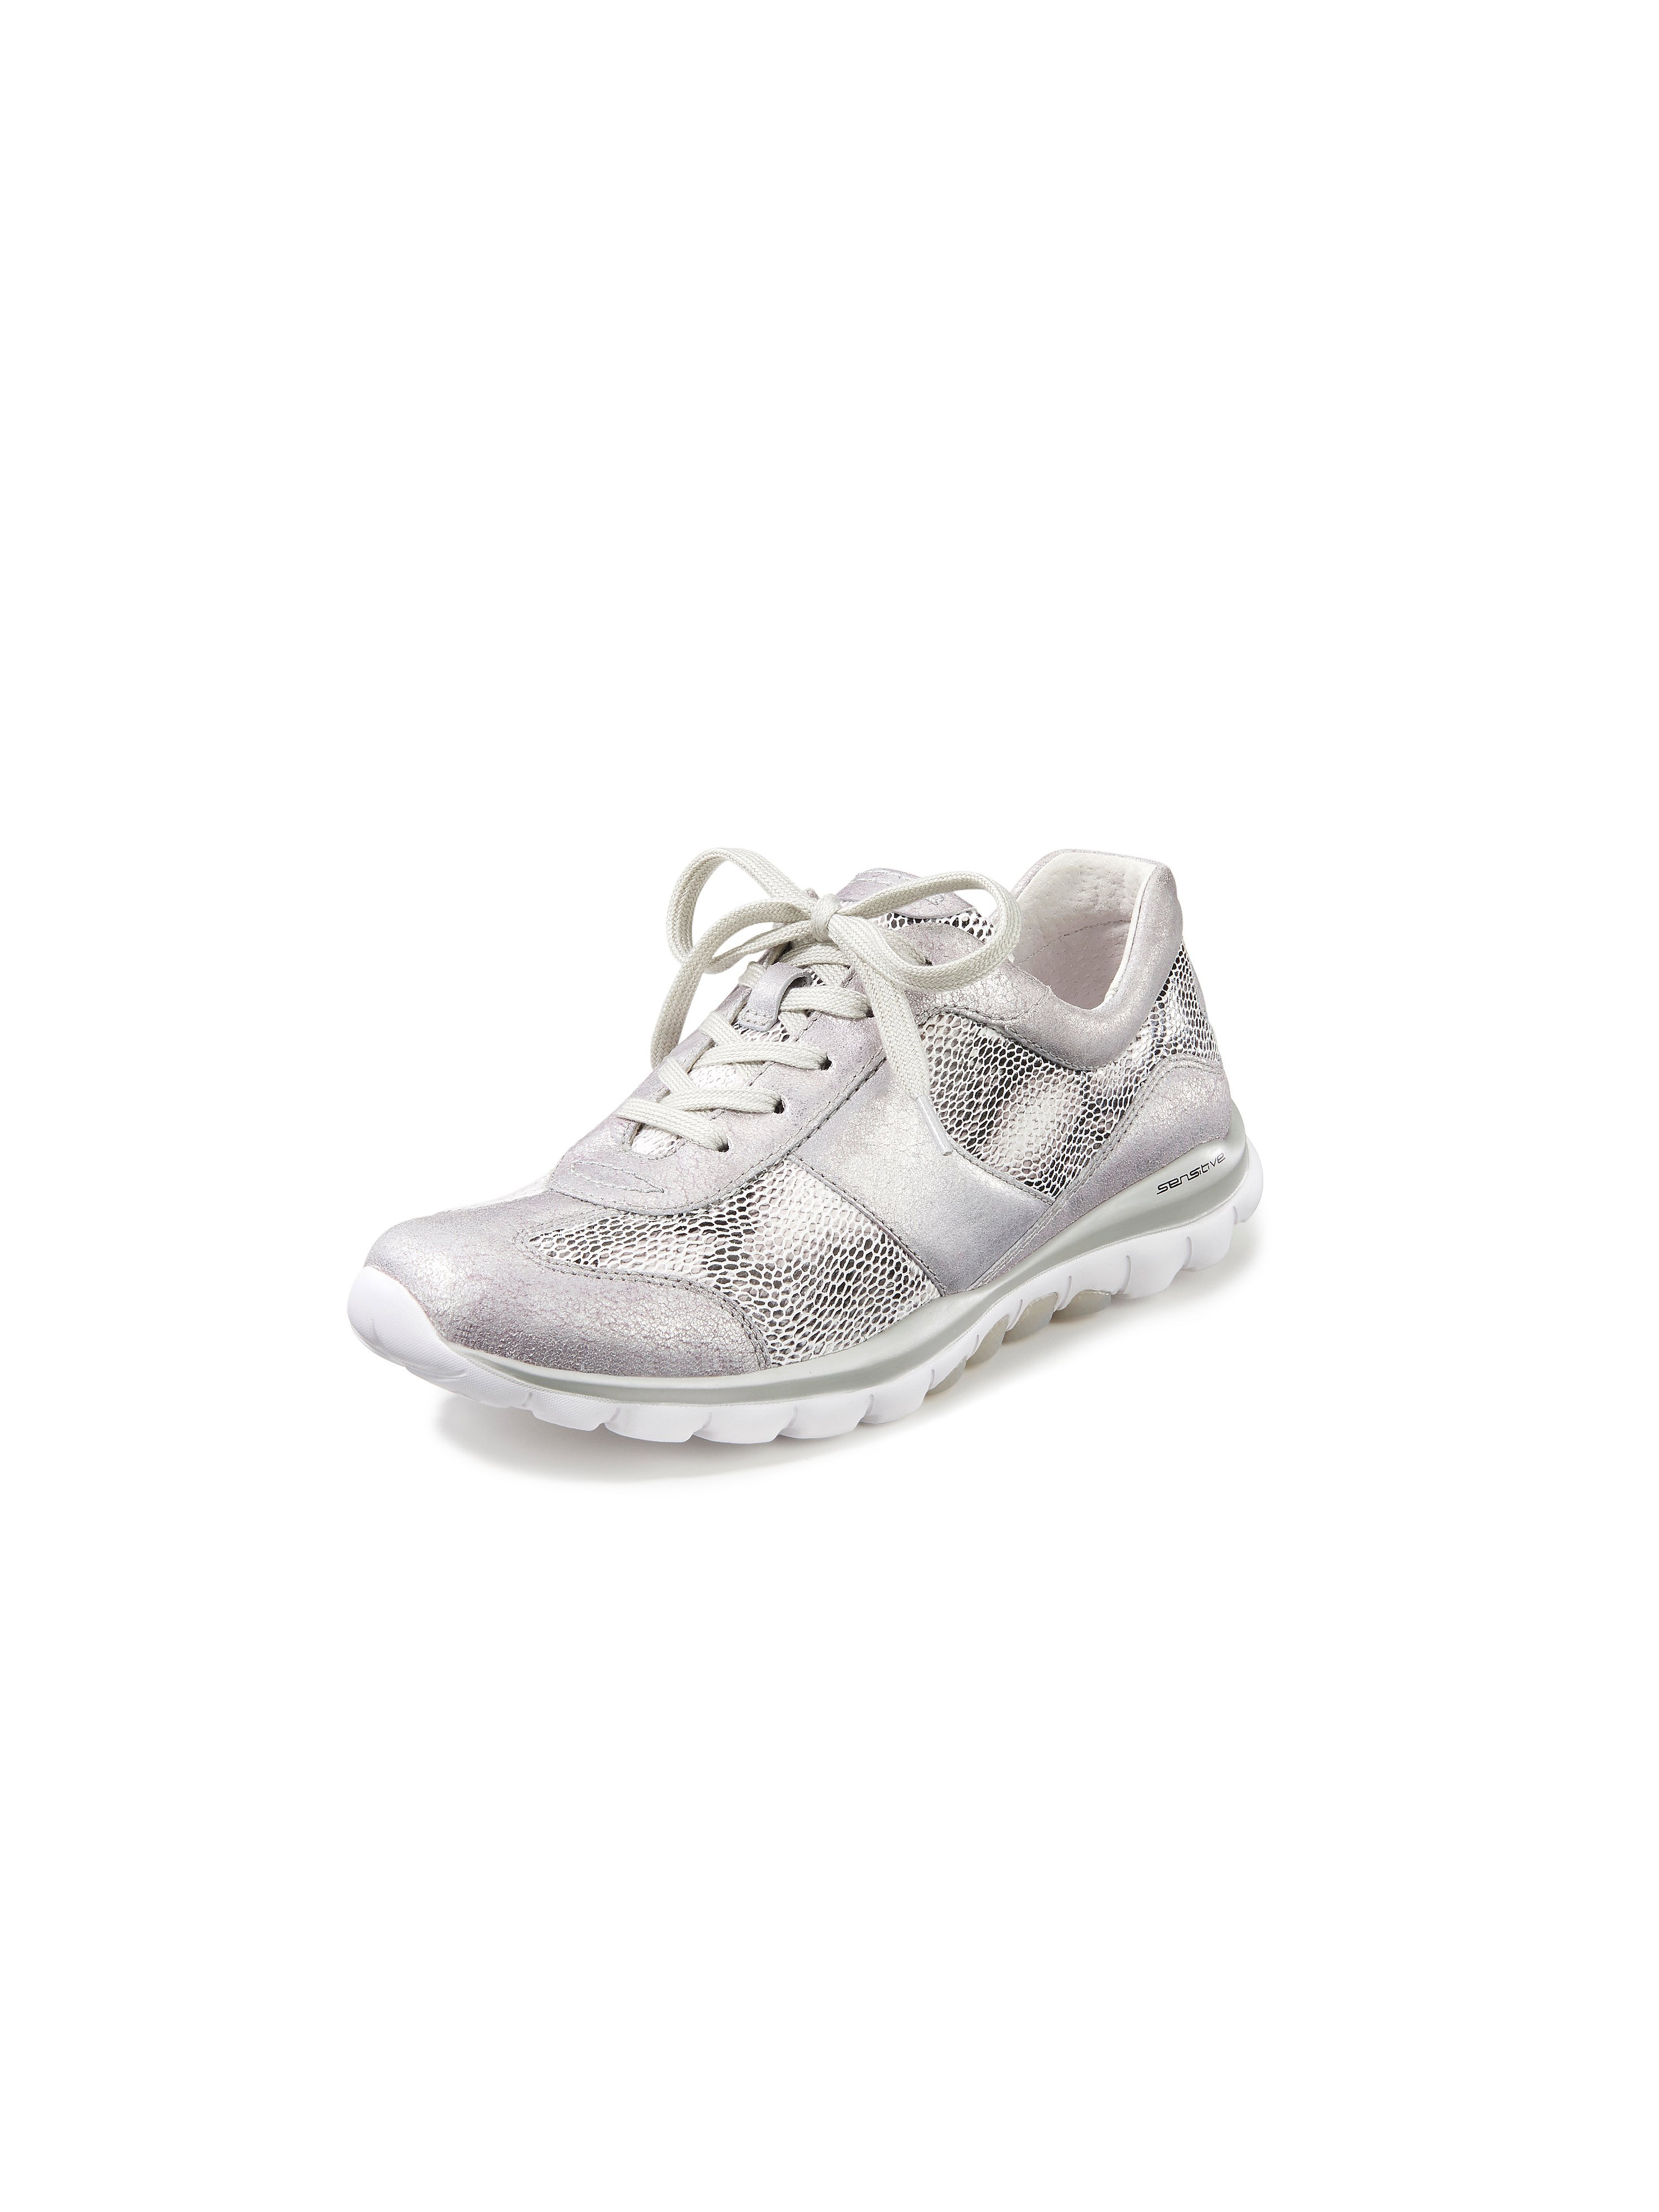 Sneakers in Rolling-Soft-Sensitive-uitvoering Van Gabor Rolling-Soft-Sensitive grijs